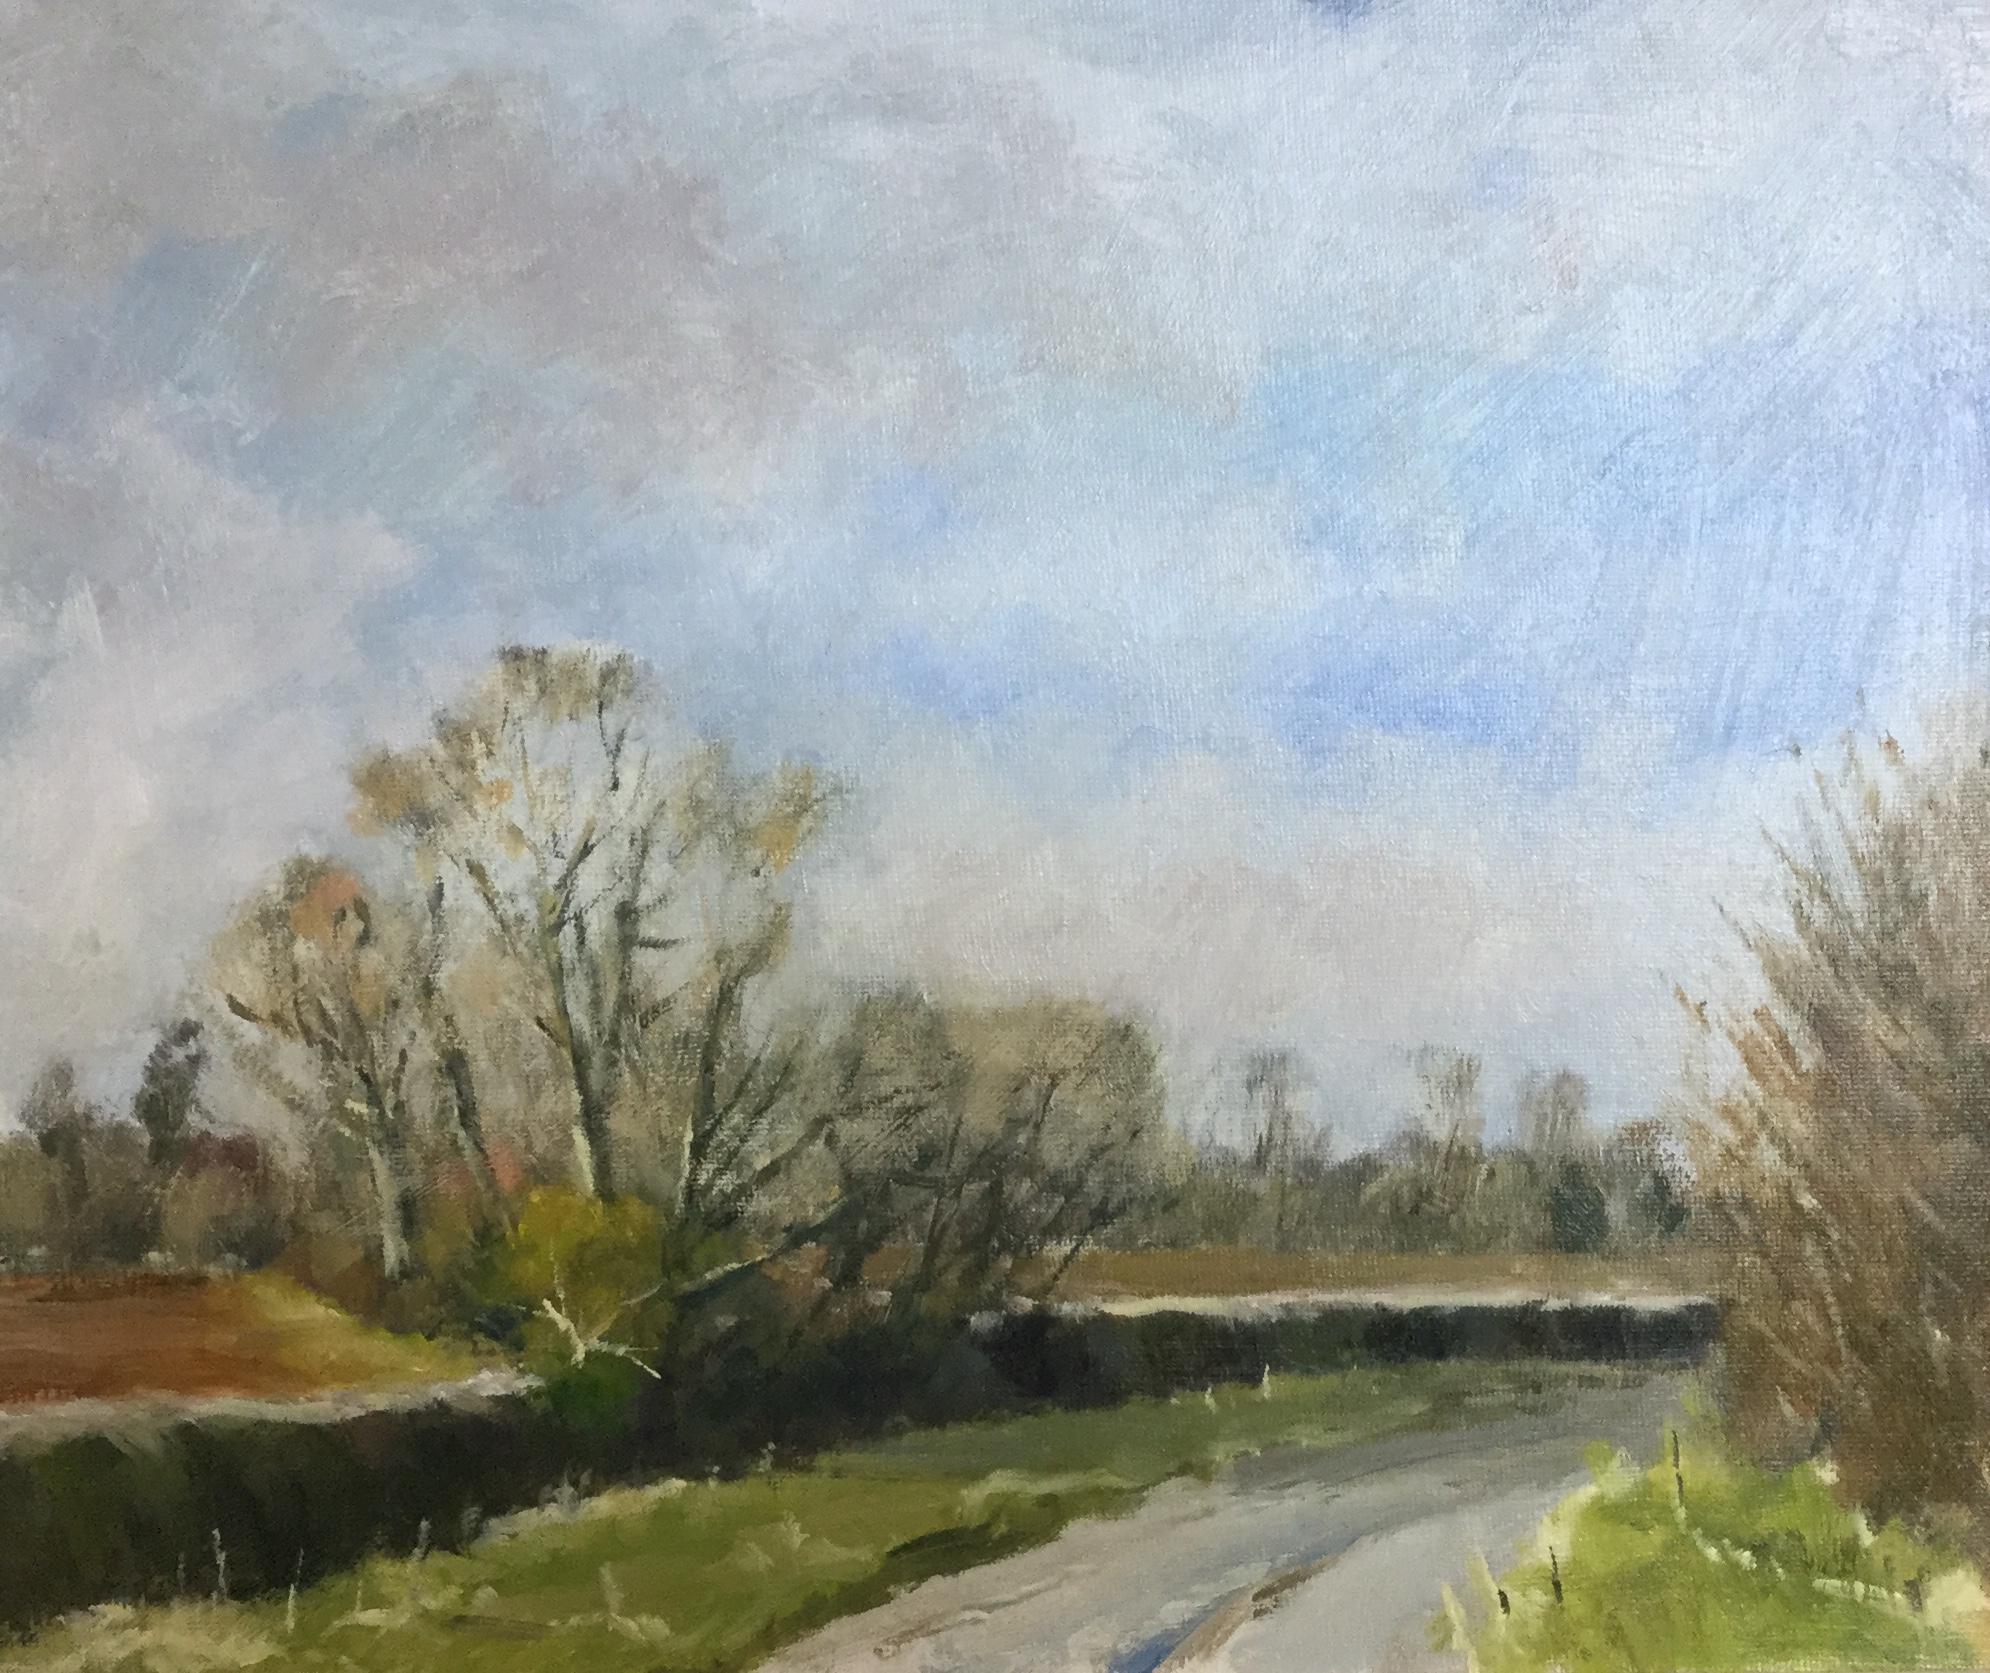 Near Litchborough